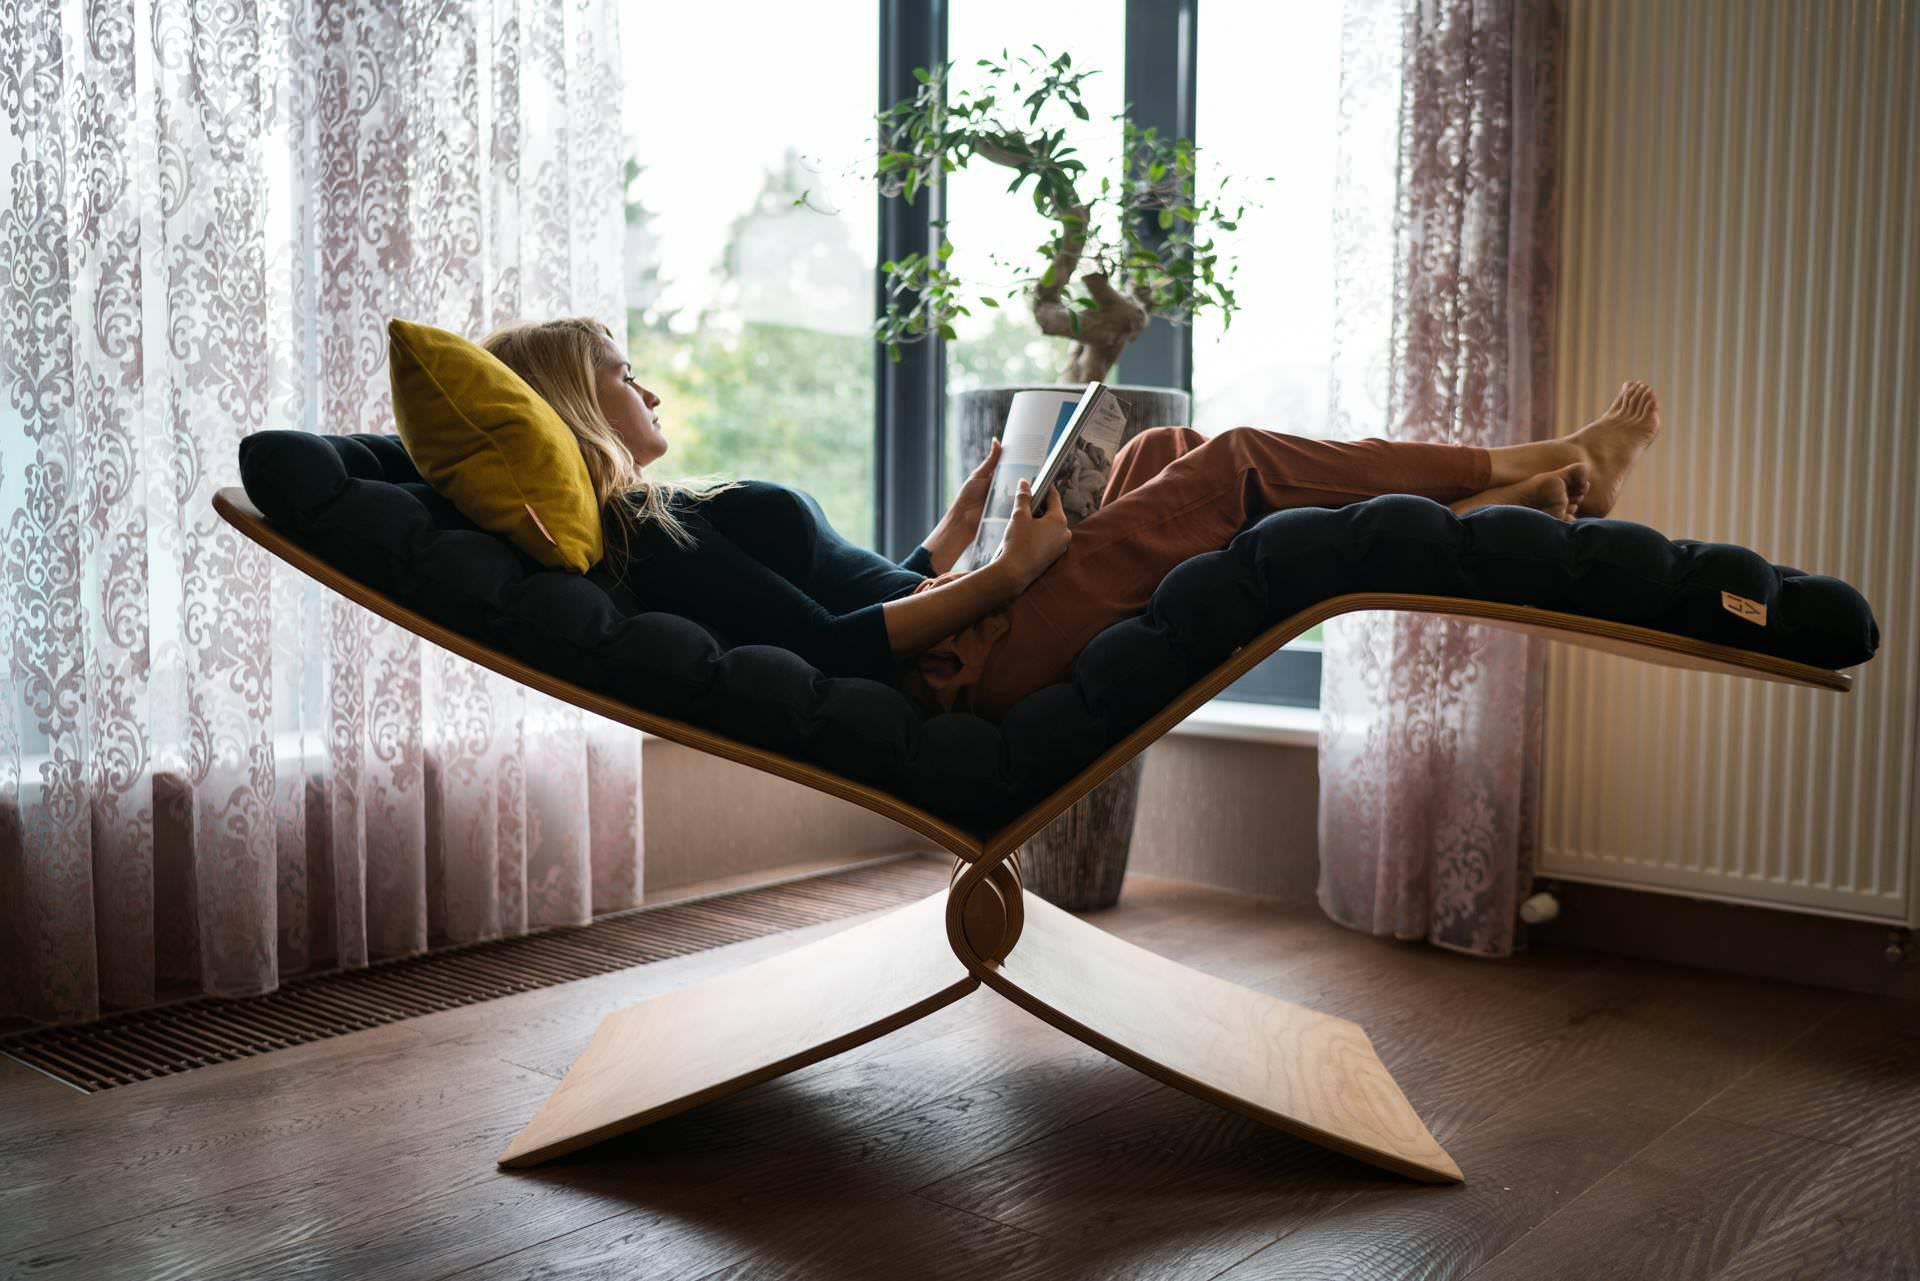 relaxacni-lehatko-egremi